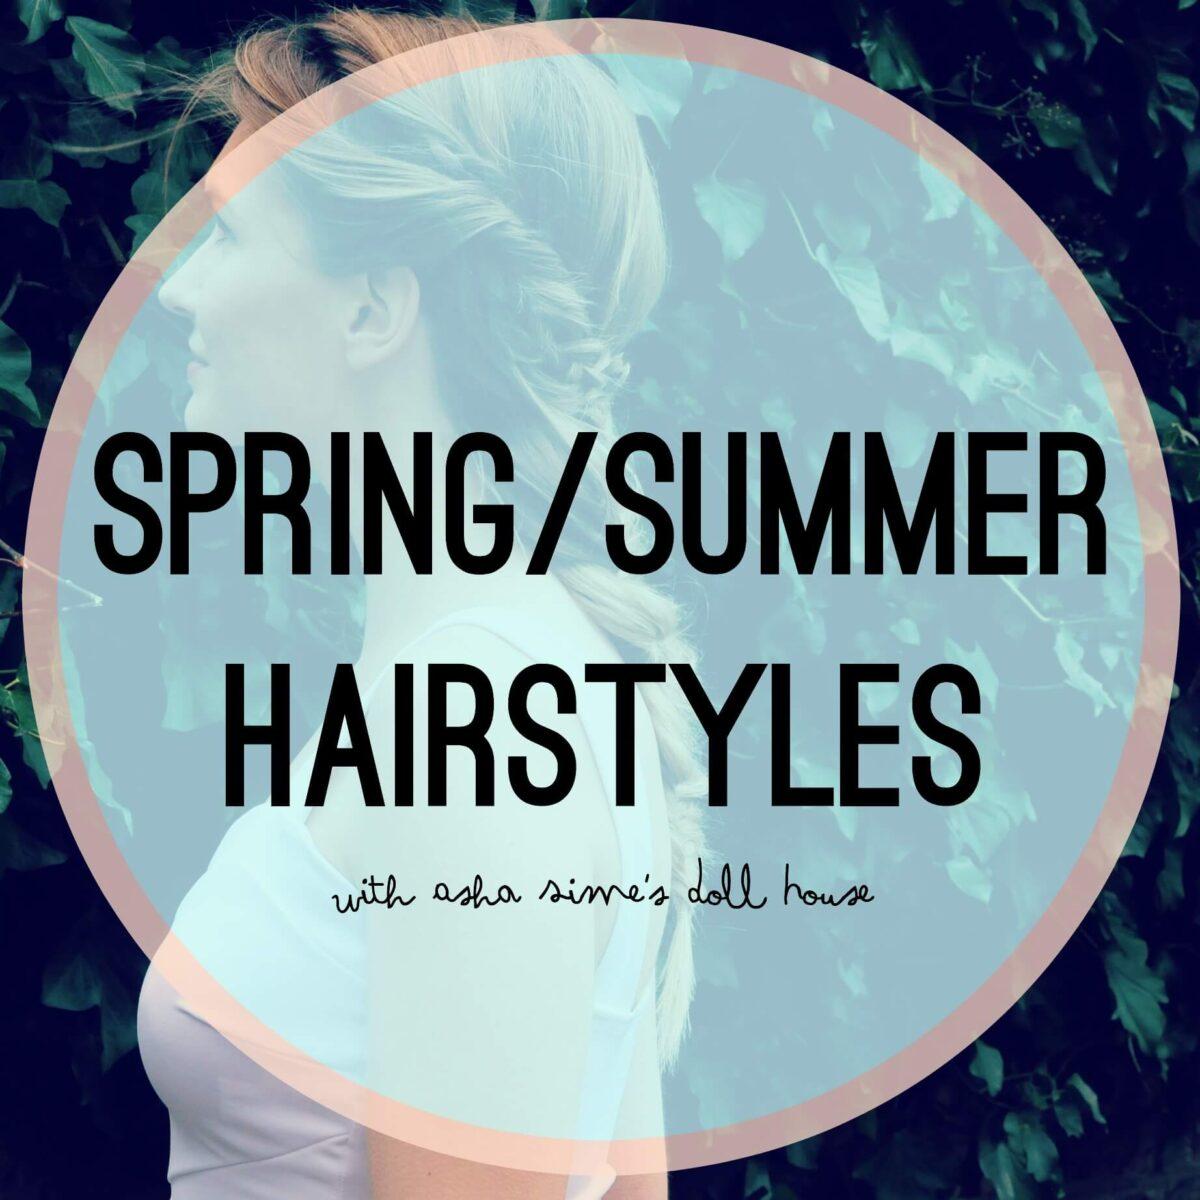 Spring/Summer Hairstyles